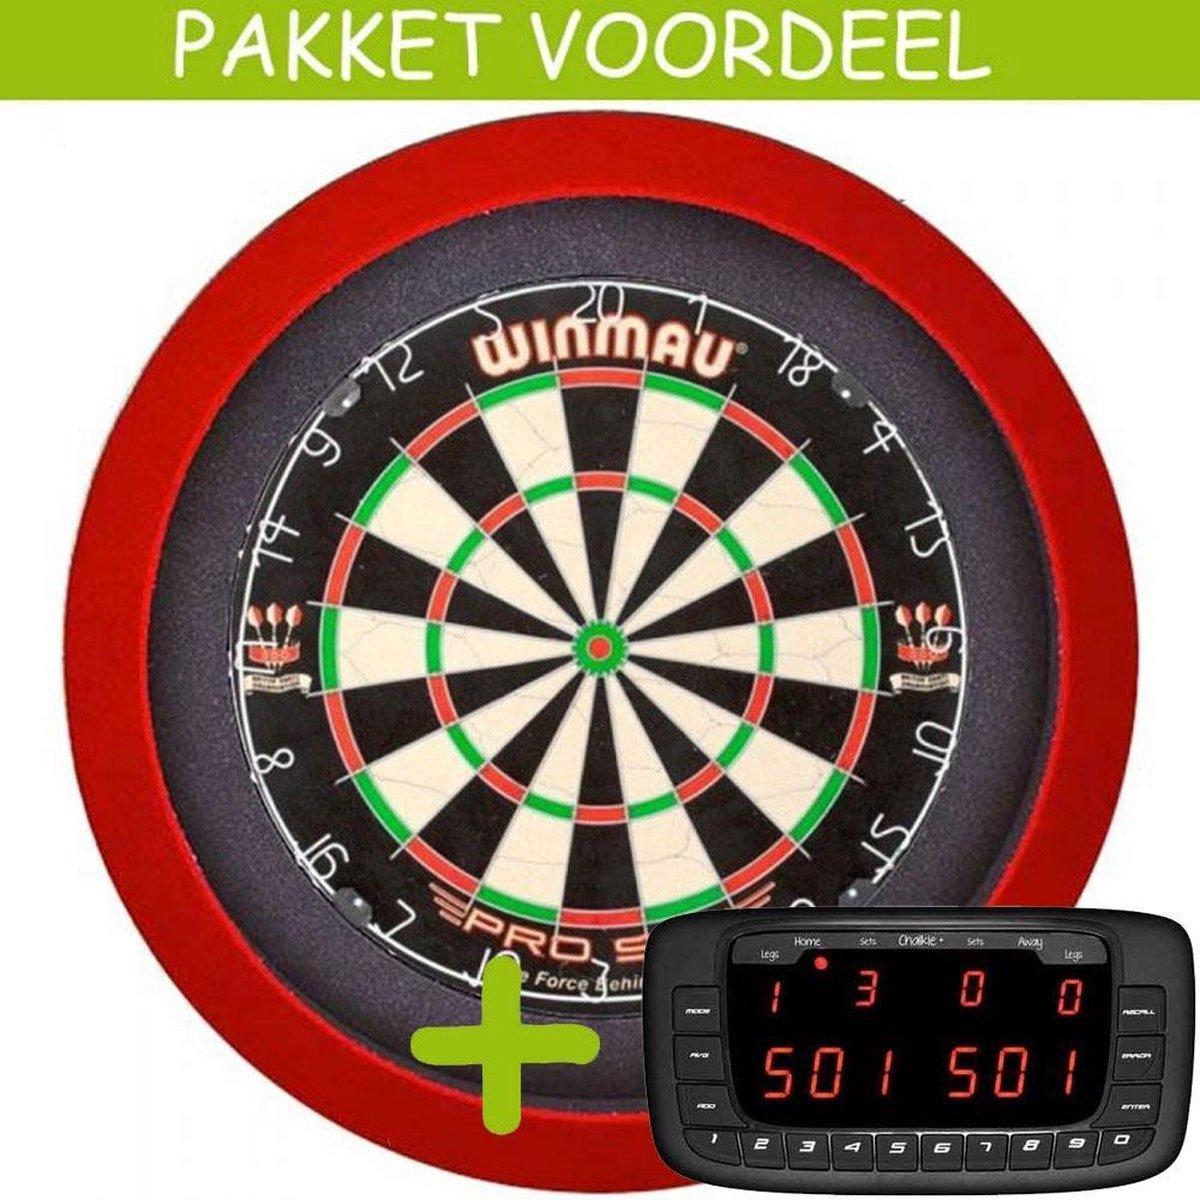 Elektronisch Dart Scorebord VoordeelPakket (Chalkie + ) - Pro SFB - Dartbordverlichting Basic (Rood)